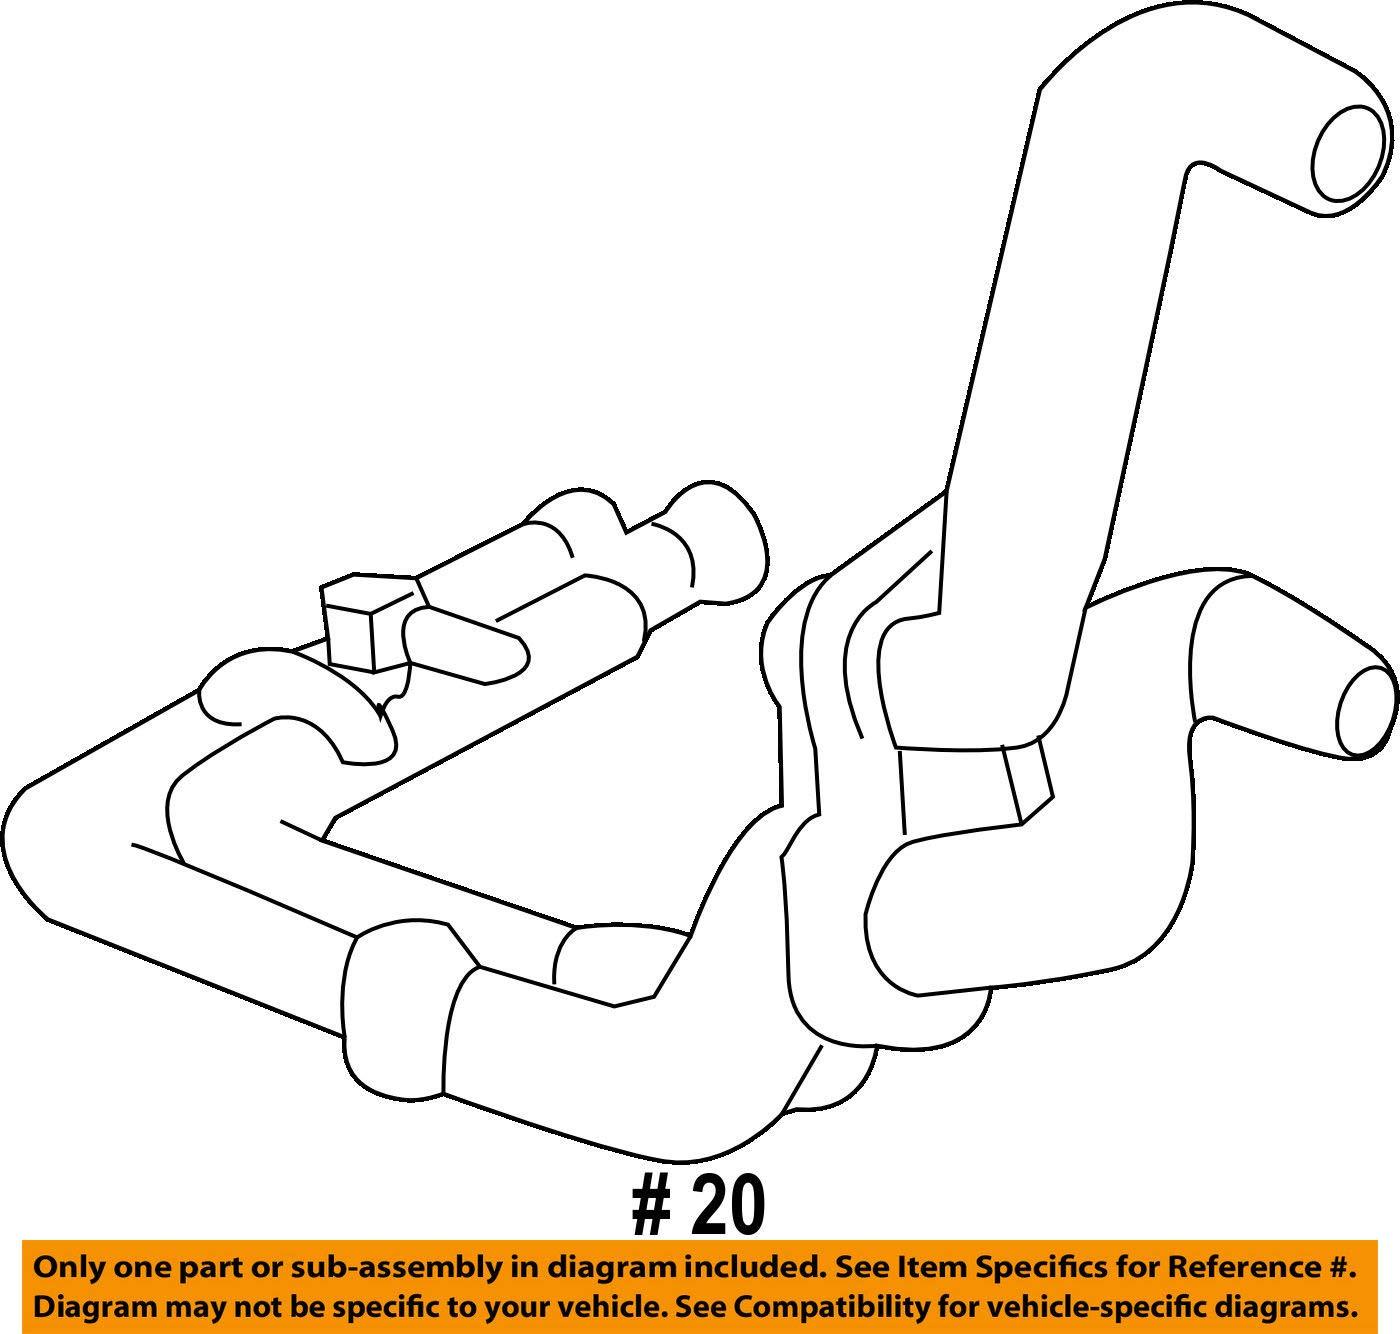 Porsche OEM 15-17 Cayenne 3.0L-V6-Cooling Pipe 95810627001 by Porsche (Image #2)